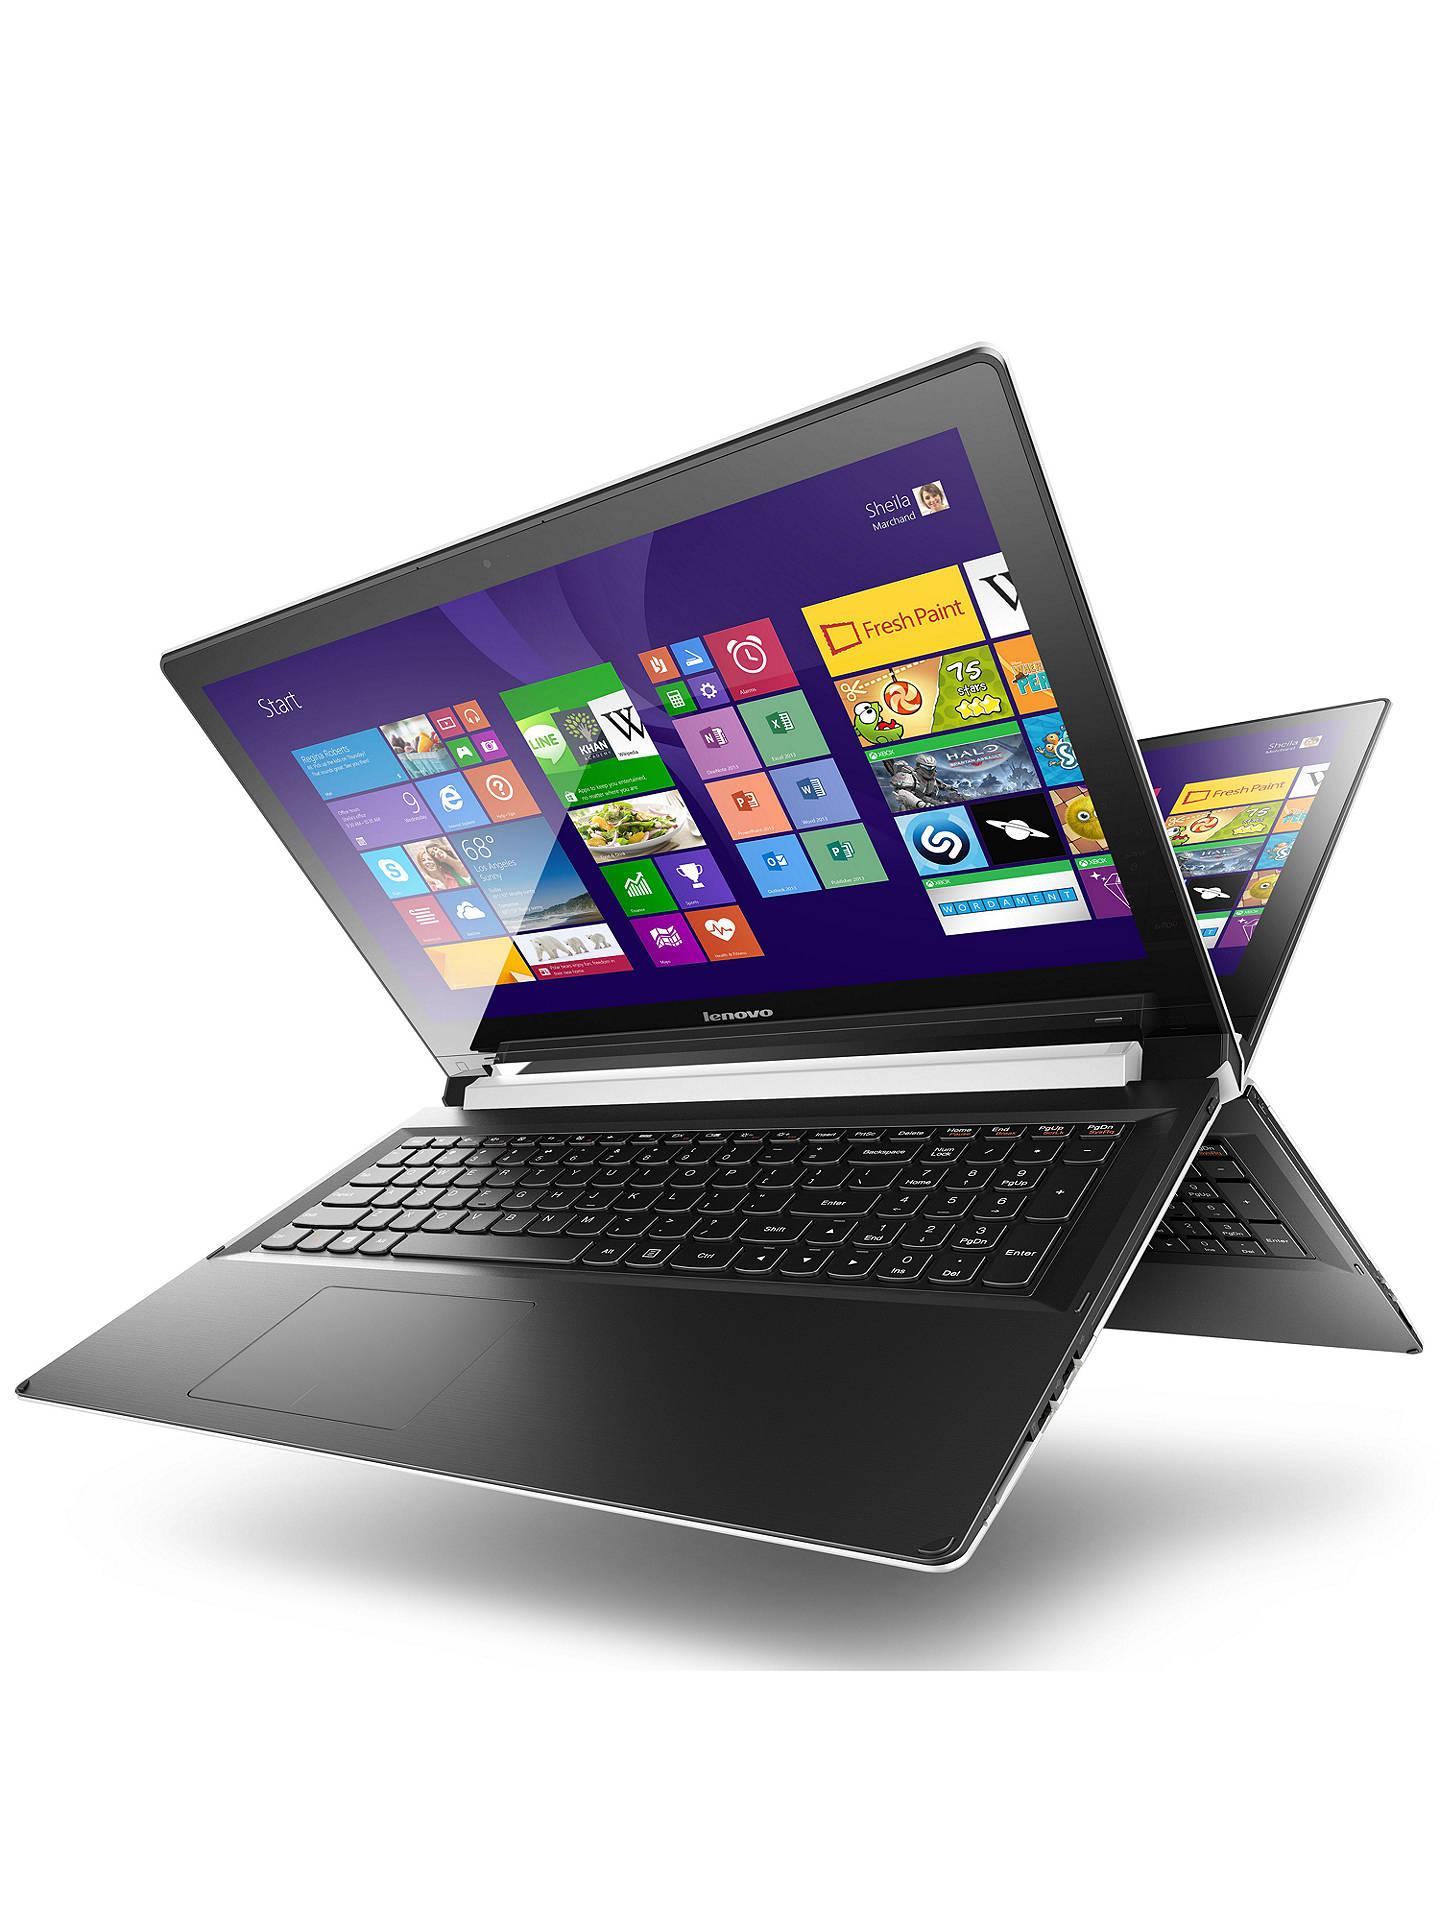 Lenovo Flex 2 Dual-Mode Laptop, Intel Core i5, 8GB RAM, 1TB